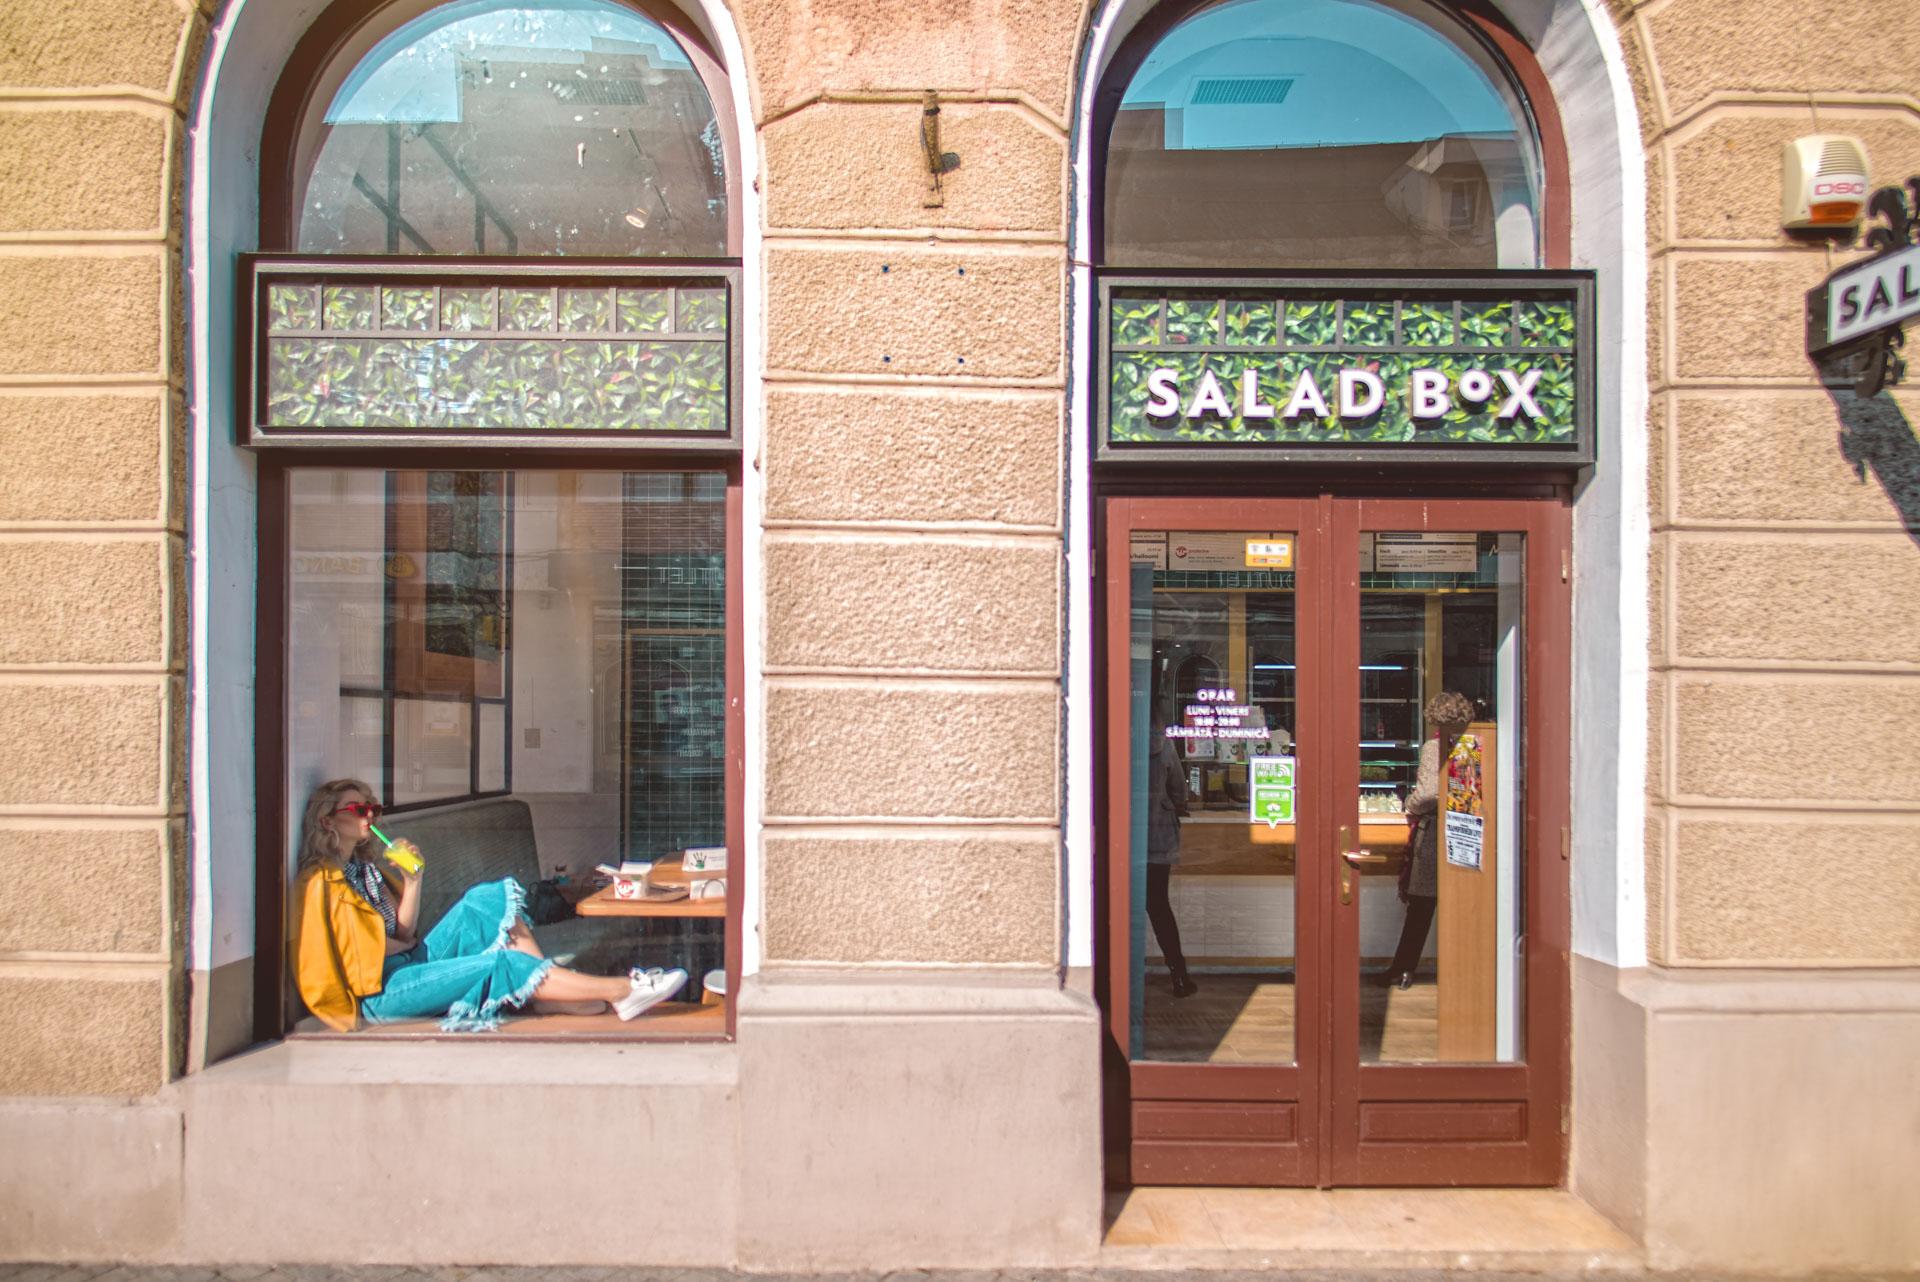 Fatada Salad Box Republicii cu logo